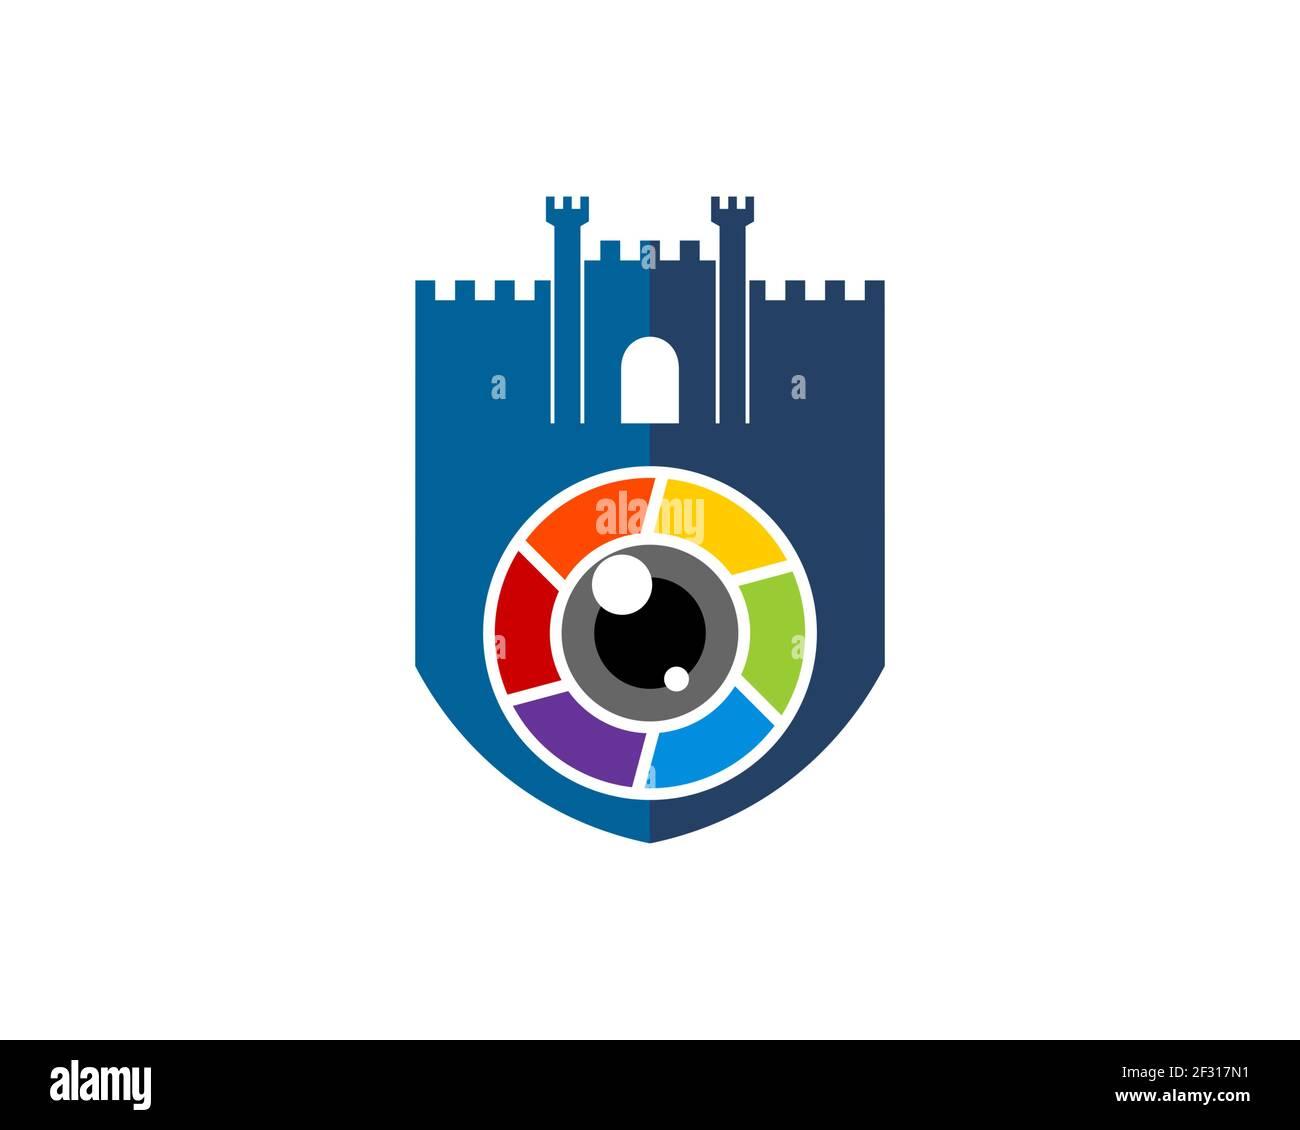 Schild Festung mit Regenbogenobjektiv Kamera Stockfoto